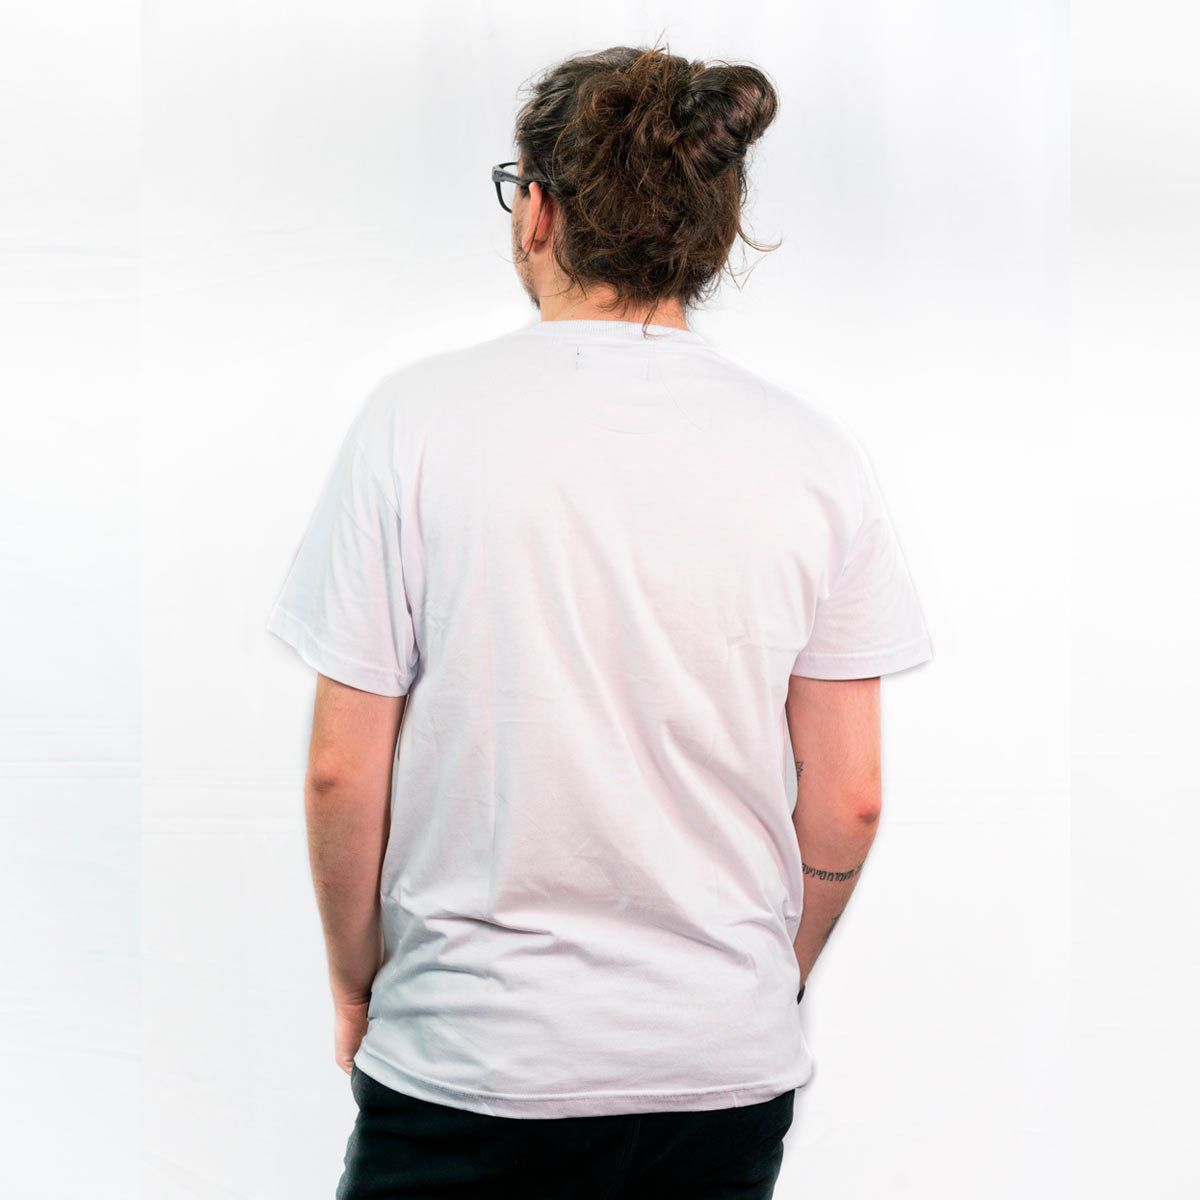 Camiseta Eh Nois  Branca Masc.   - Jesuscopy